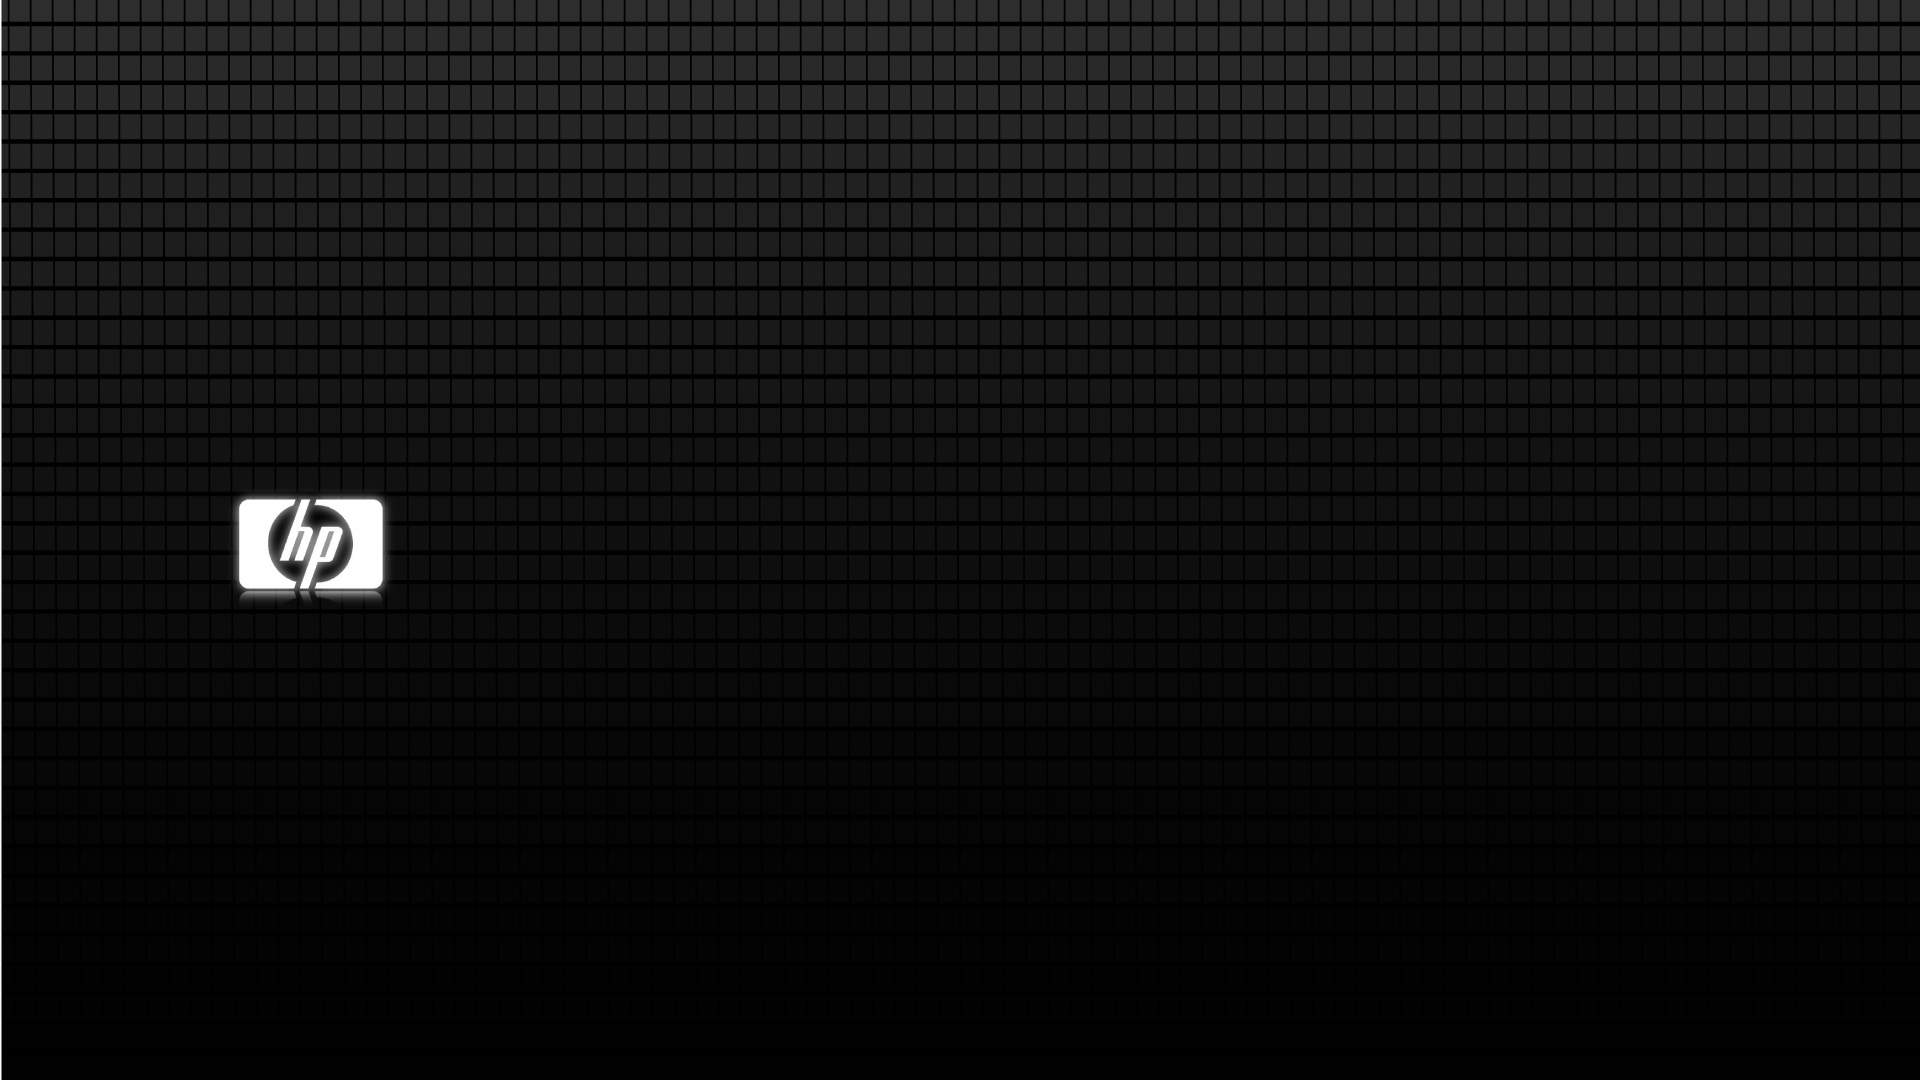 Unleashed Wwe Wallpapers John Cena Vs 1920x1200 pixel   626 kB   jpg 1920x1080